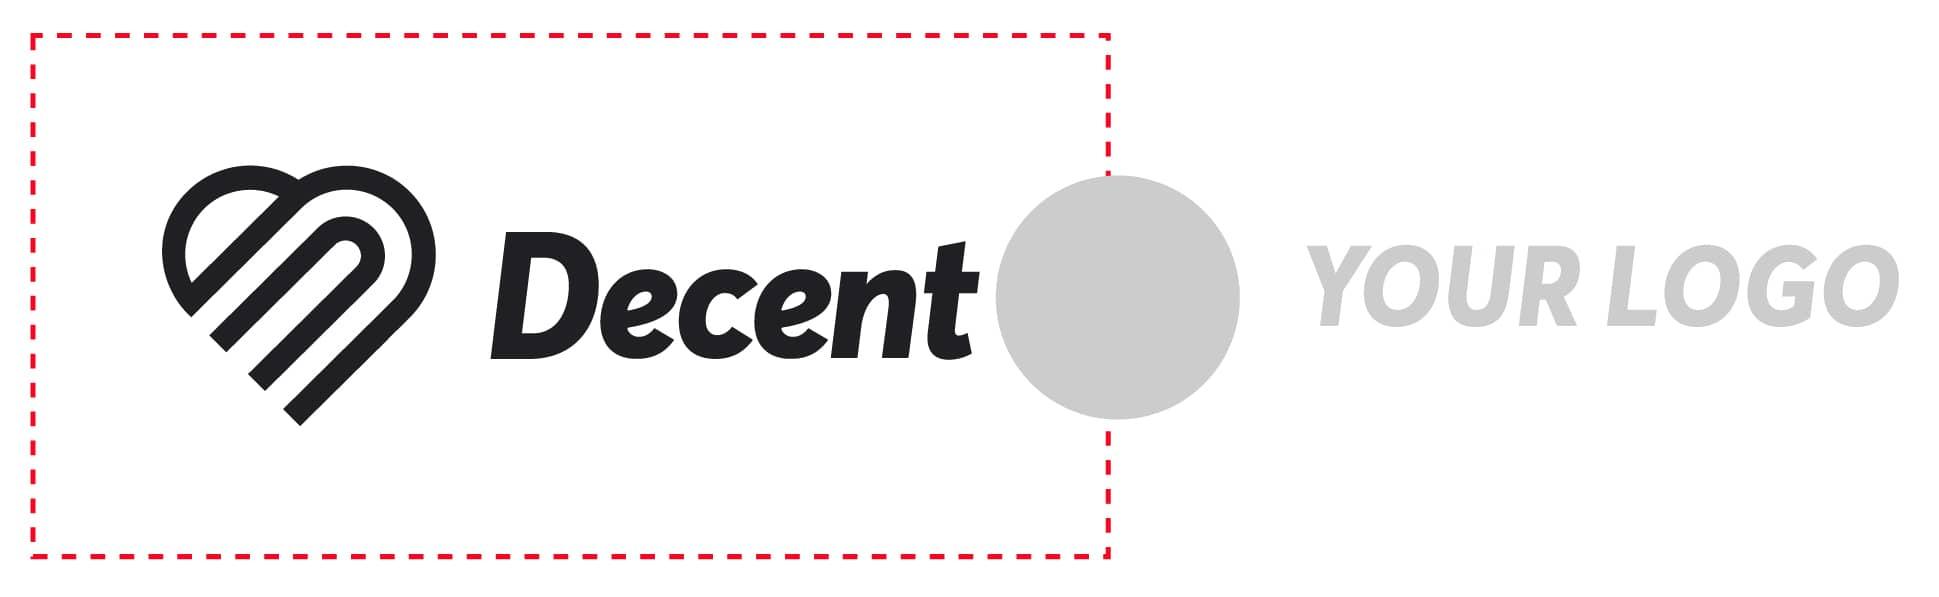 Image showing improper logo placement